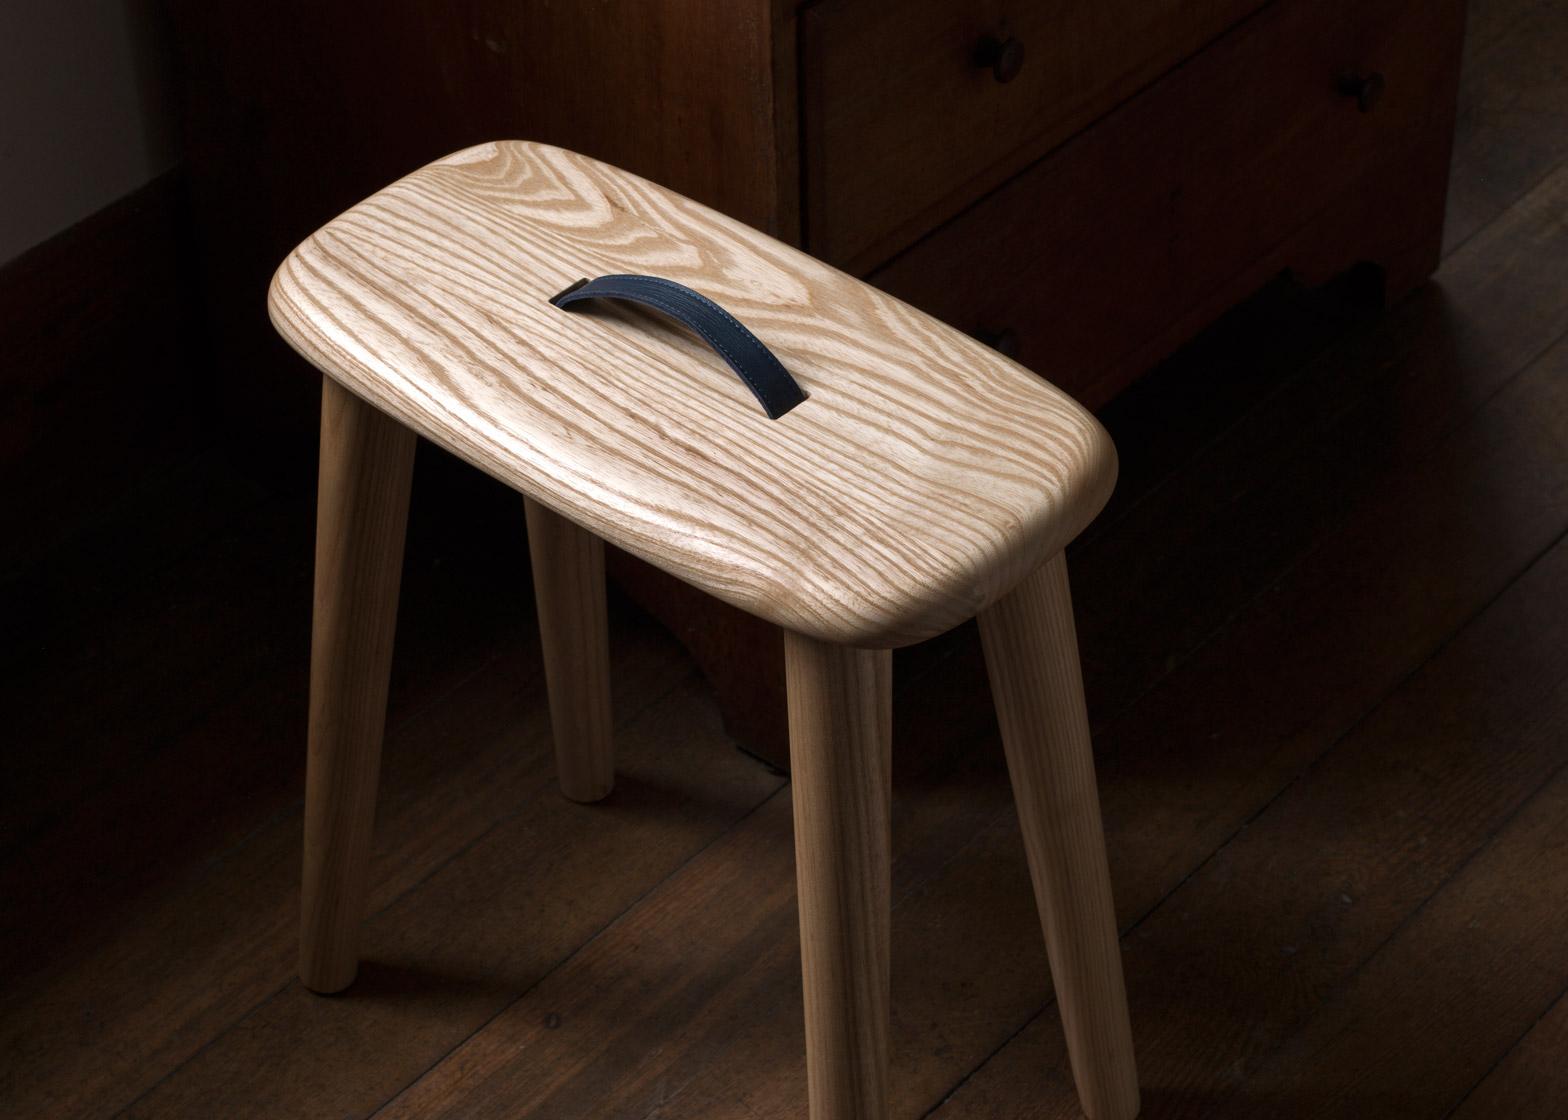 utopia furniture. 13 Of 20; Furnishing Utopia Furniture And Homeware Influenced By Shaker Designs P